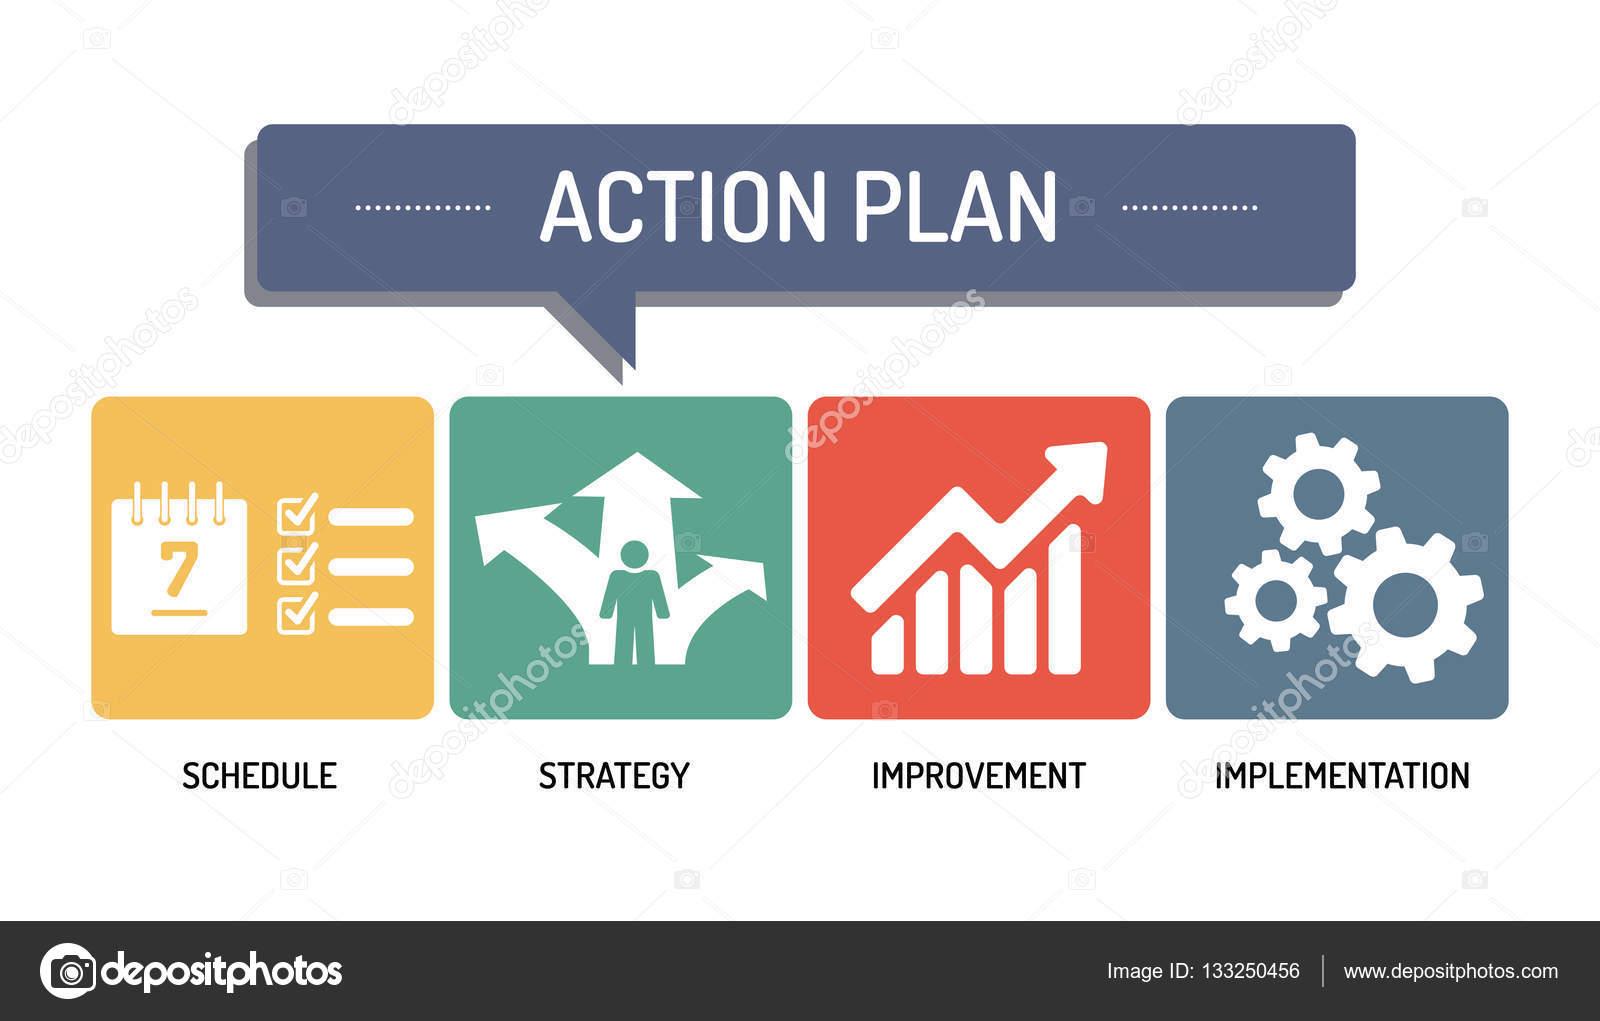 ACTION PLAN - ICON SET \u2014 Stock Vector © garagestock #133250456